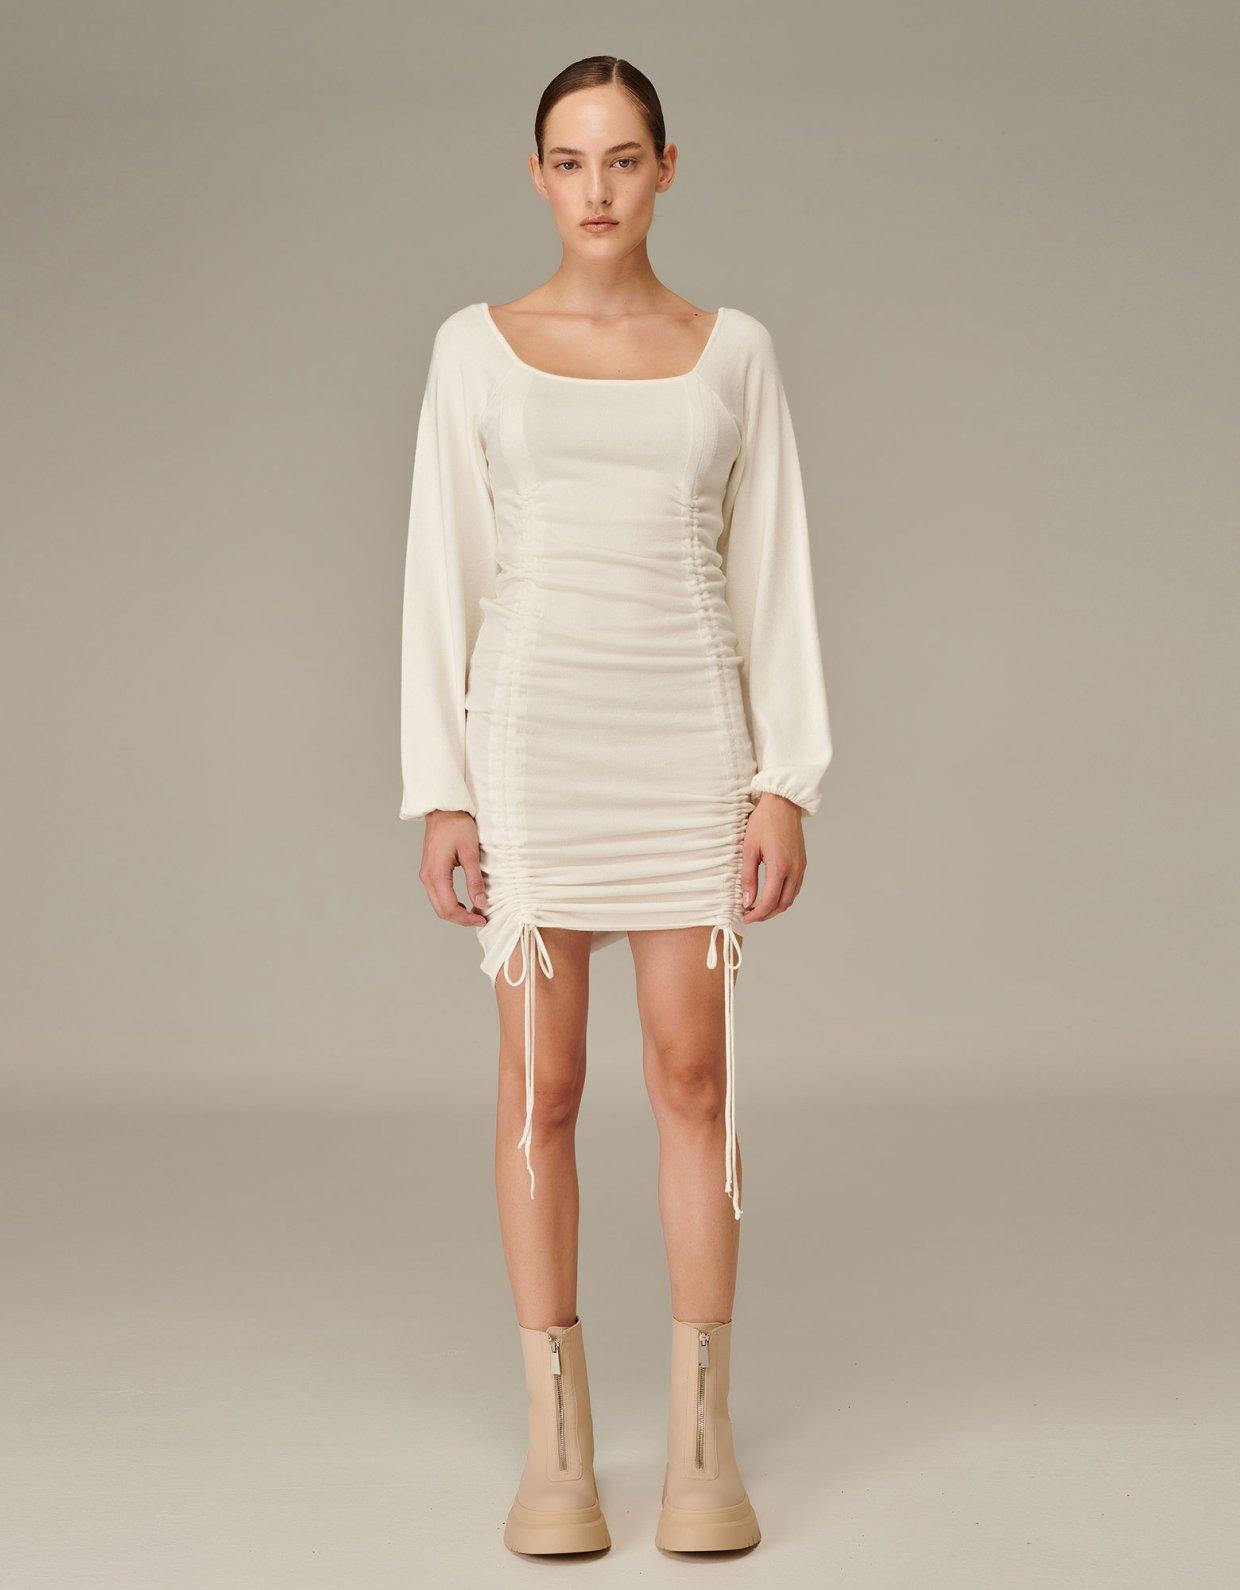 Combos Knitwear Combos W-115 White dress